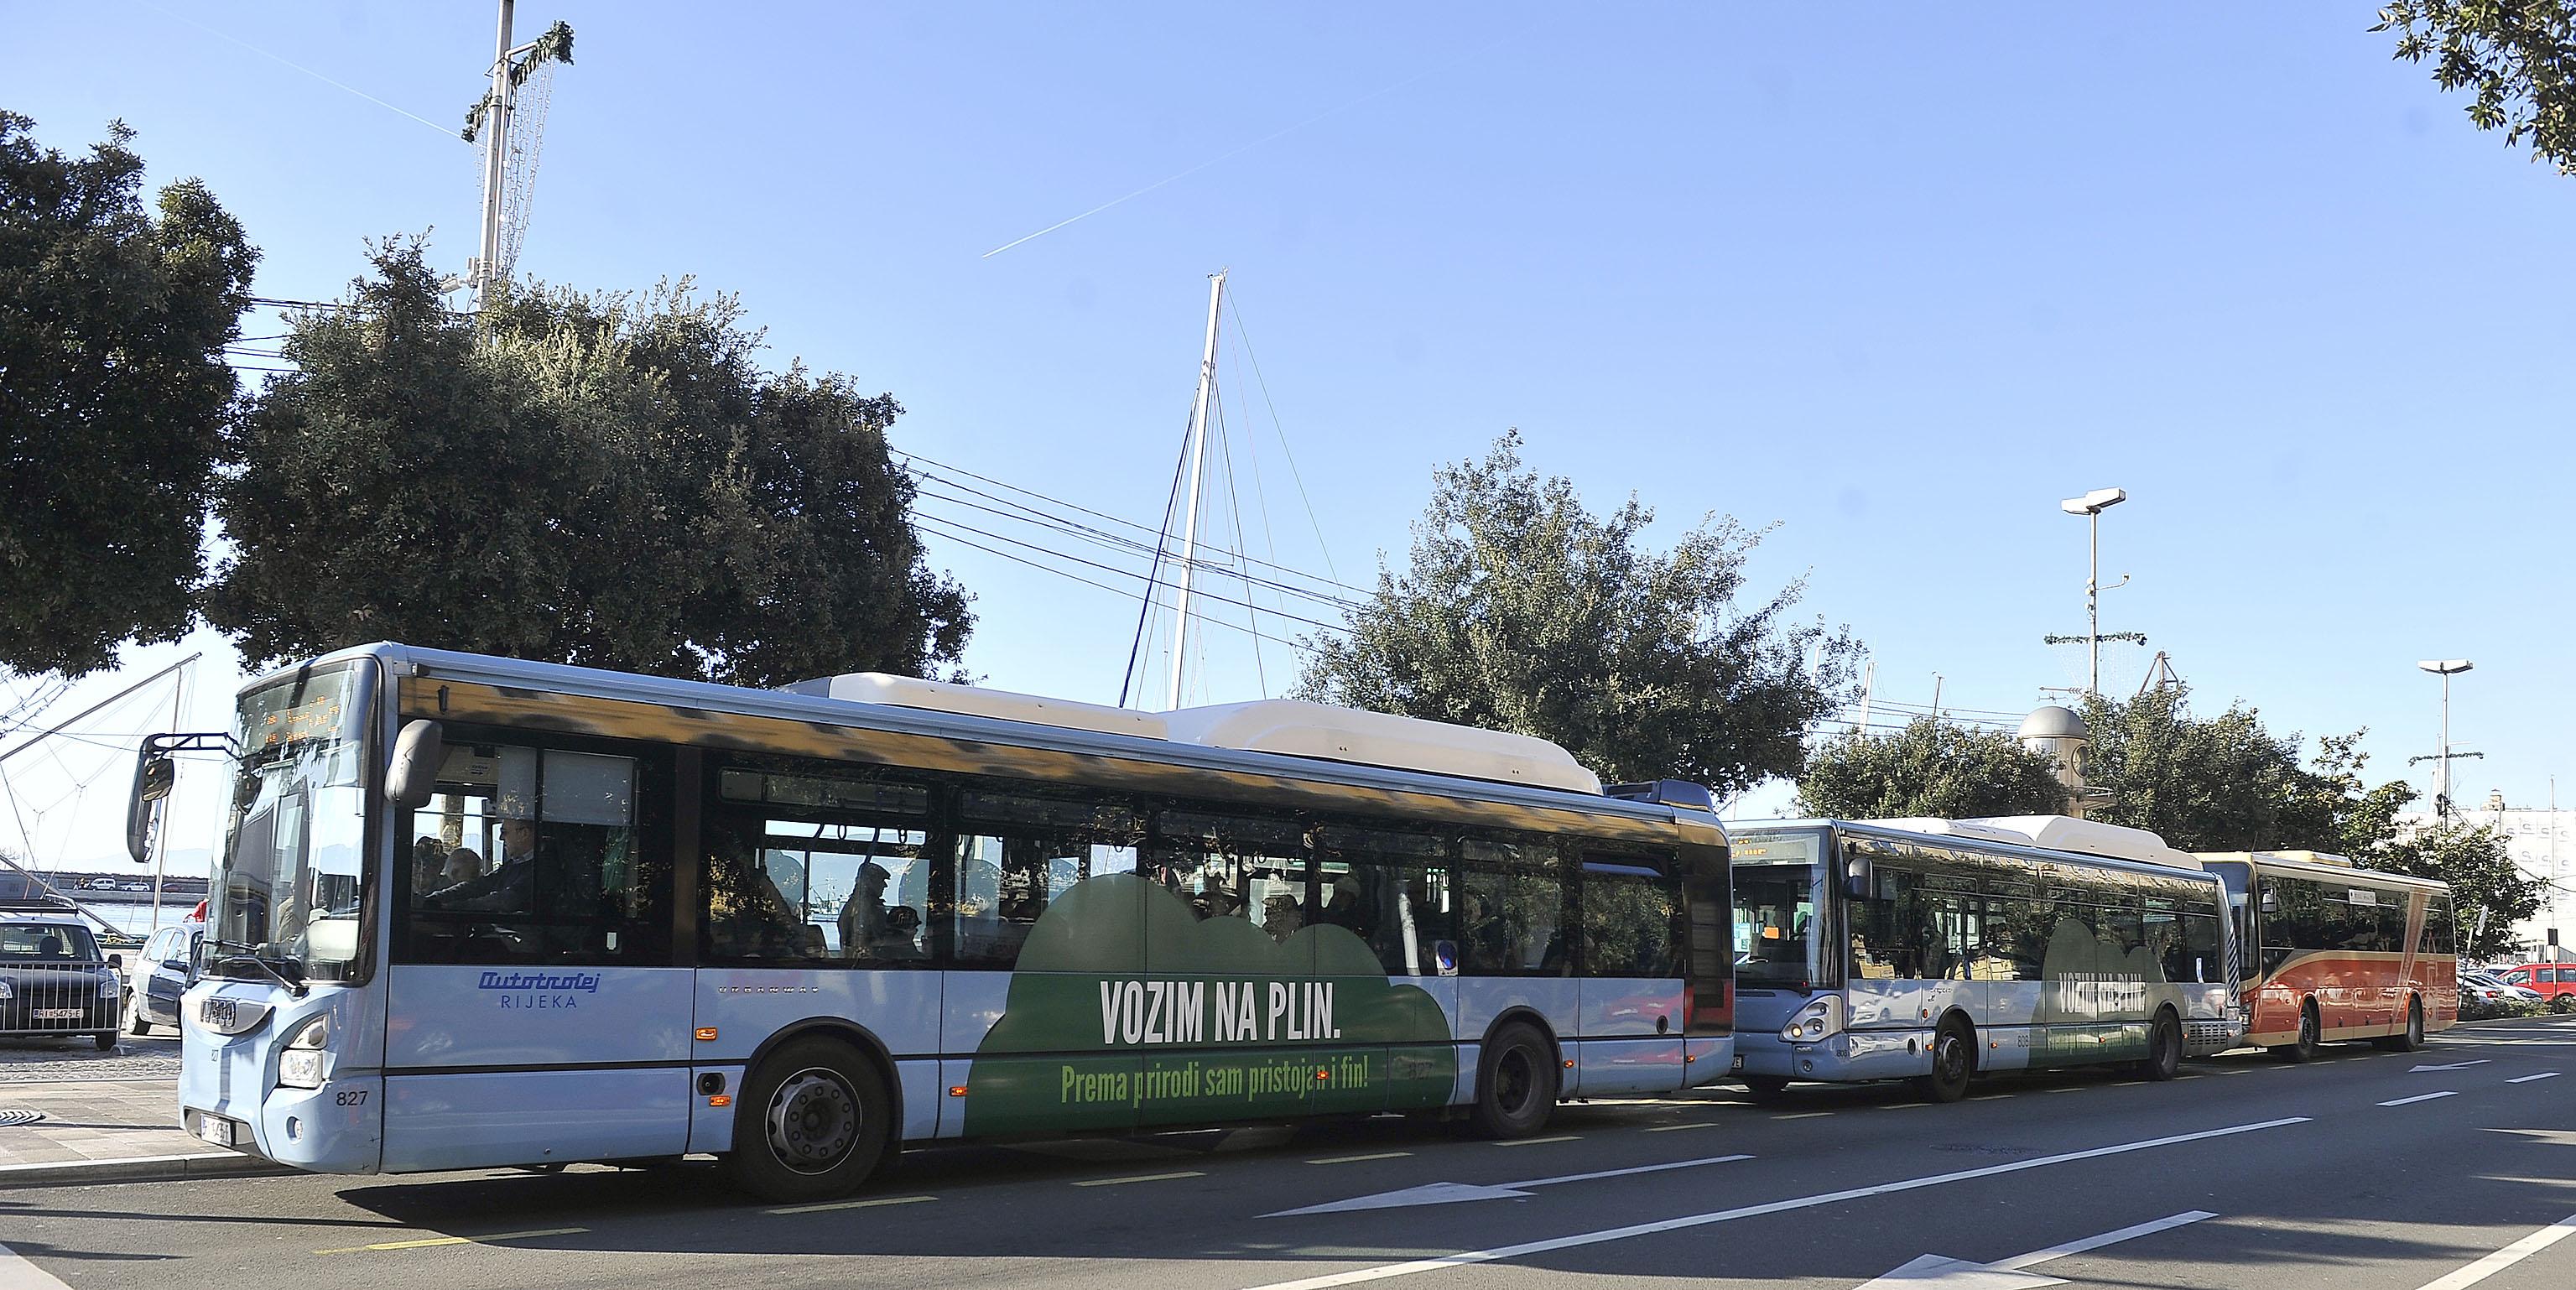 Novi autobusi Autotroleja i novi, na niže korigirani, vozni red / Snimio Roni BRMALJ